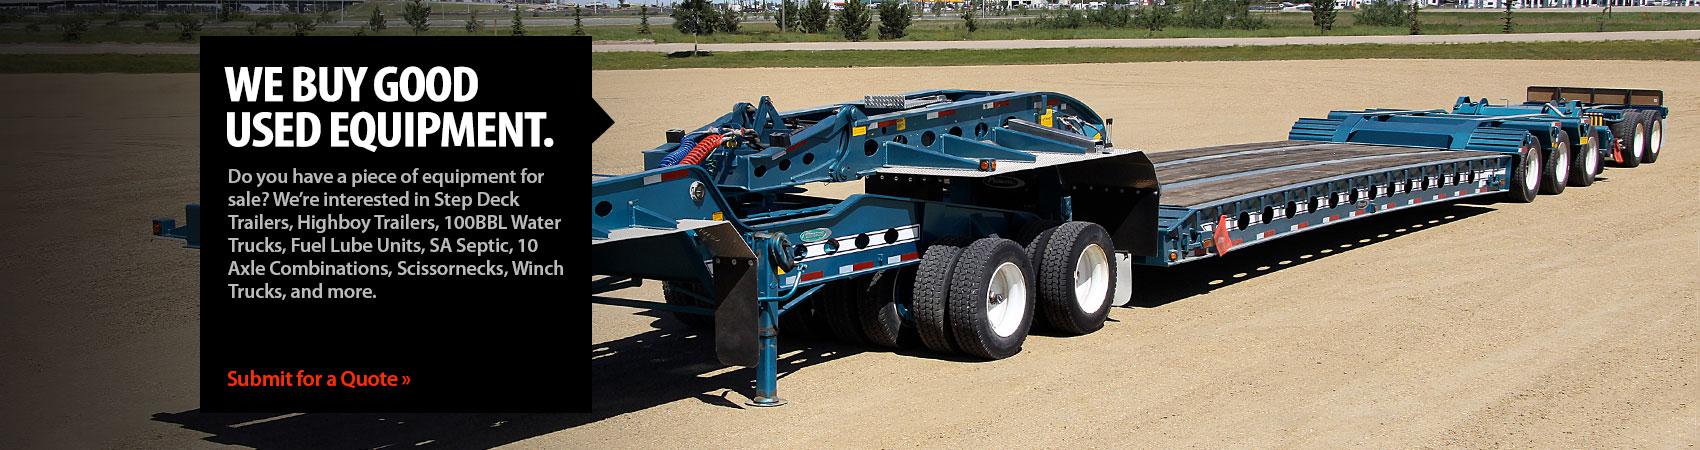 Heavy Trucks for Sale - Brandt Truck Rigging & trailers